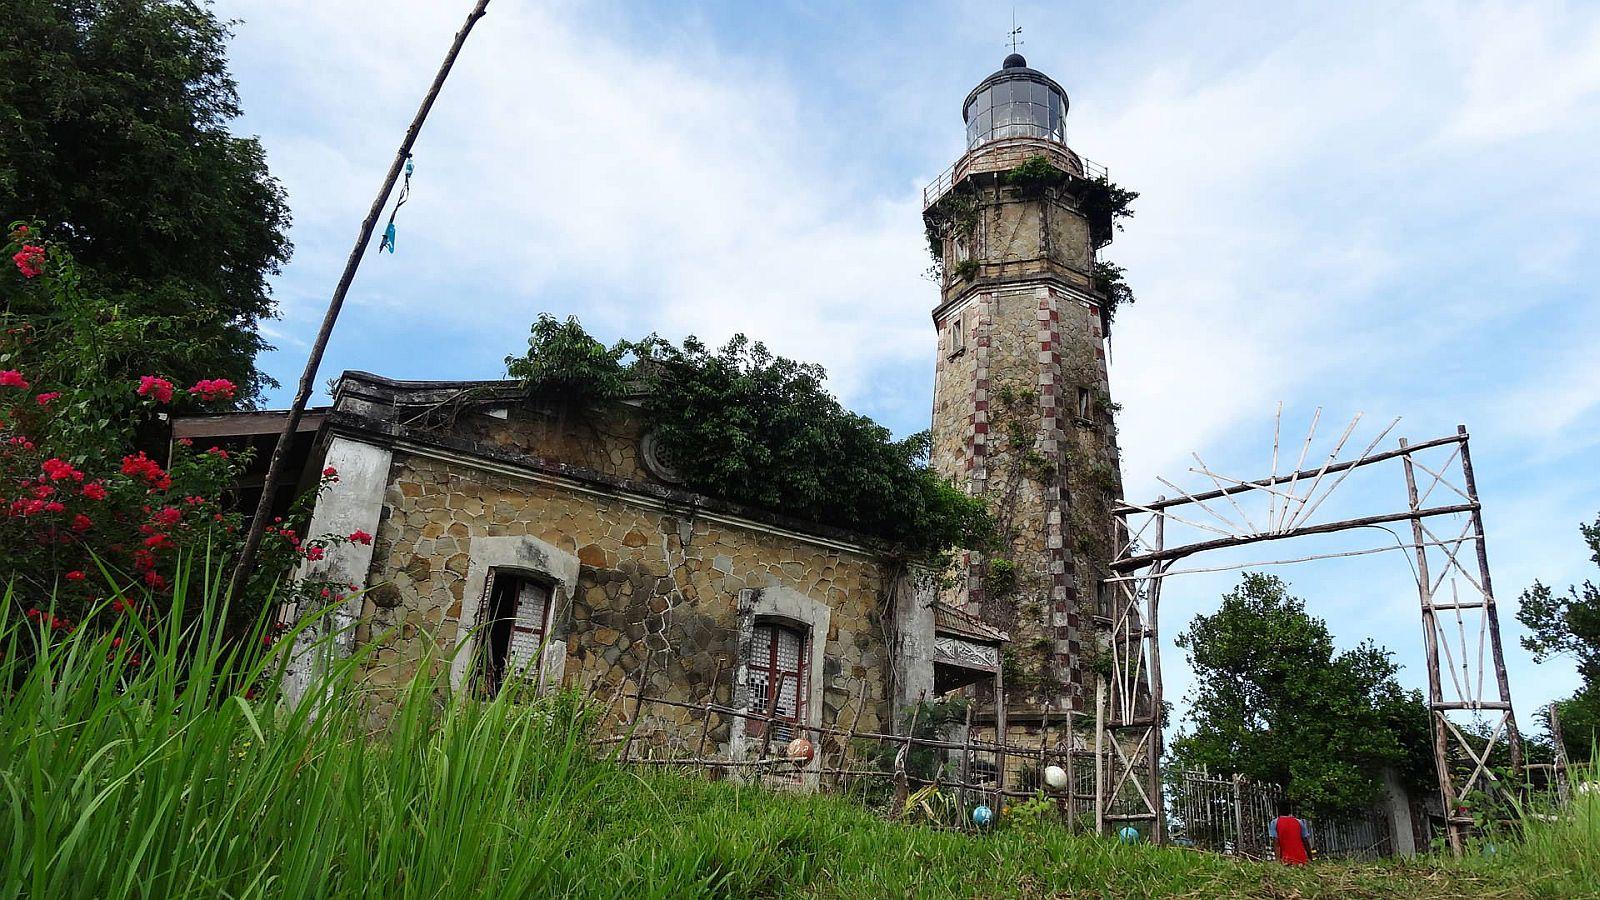 PHILIPPINEN REISEN - LEUCHTTÜRME - Cape Melville Leuchtturm